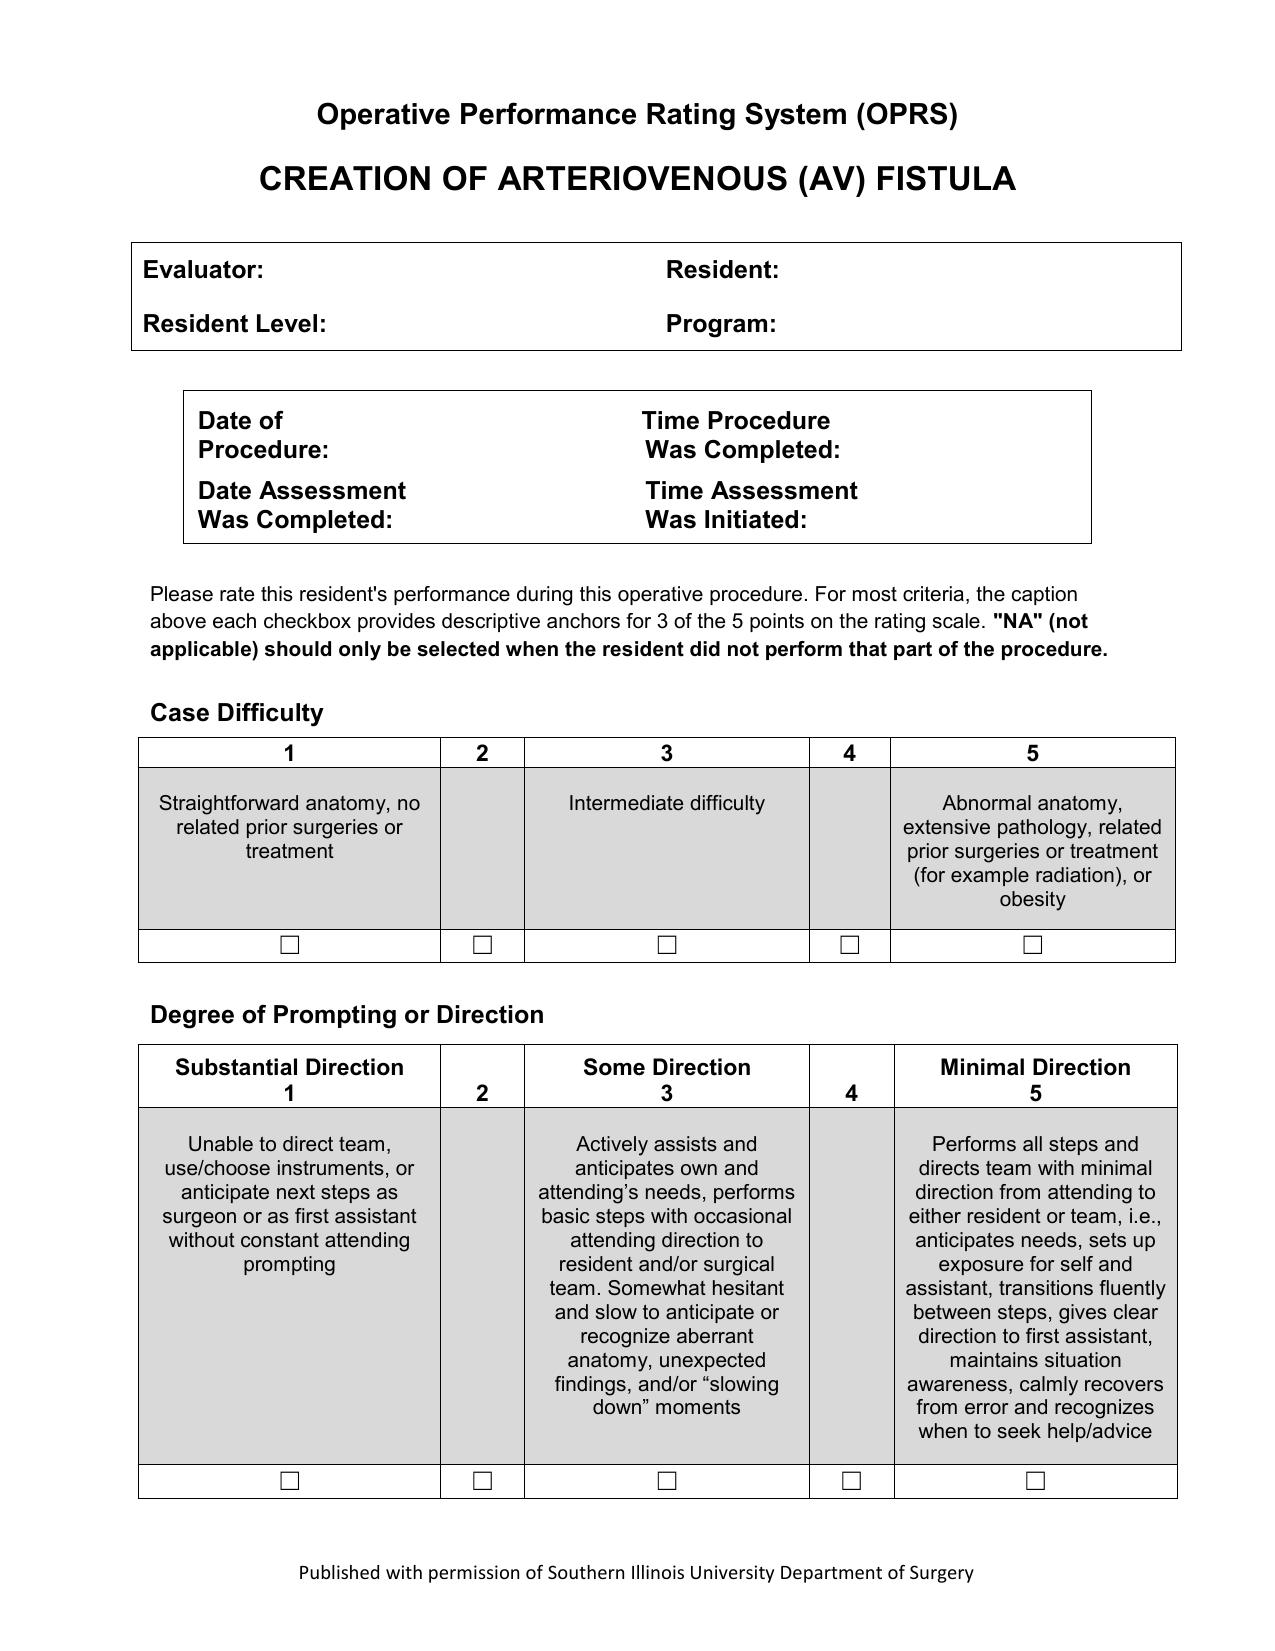 Creation of AV Fistula – Page 1 Operative Performance Rating